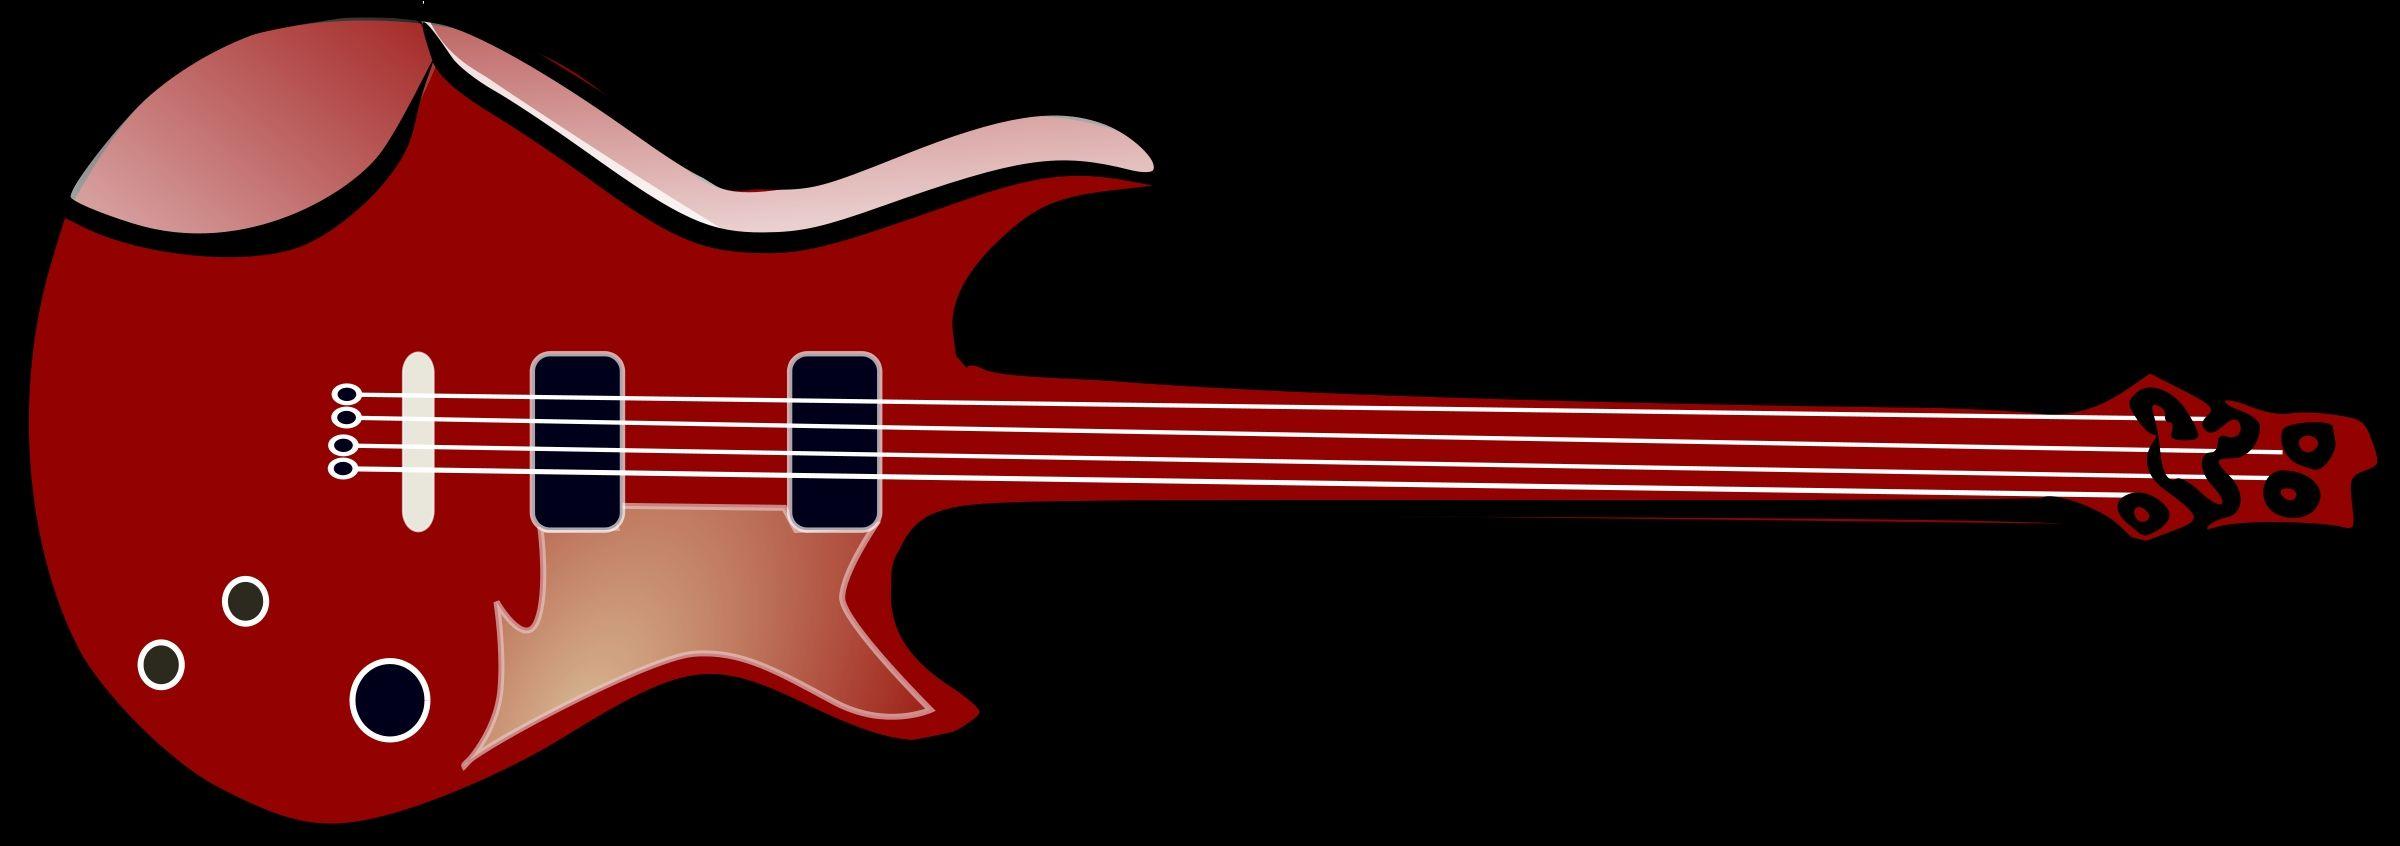 Bass Guitar Clipart Images